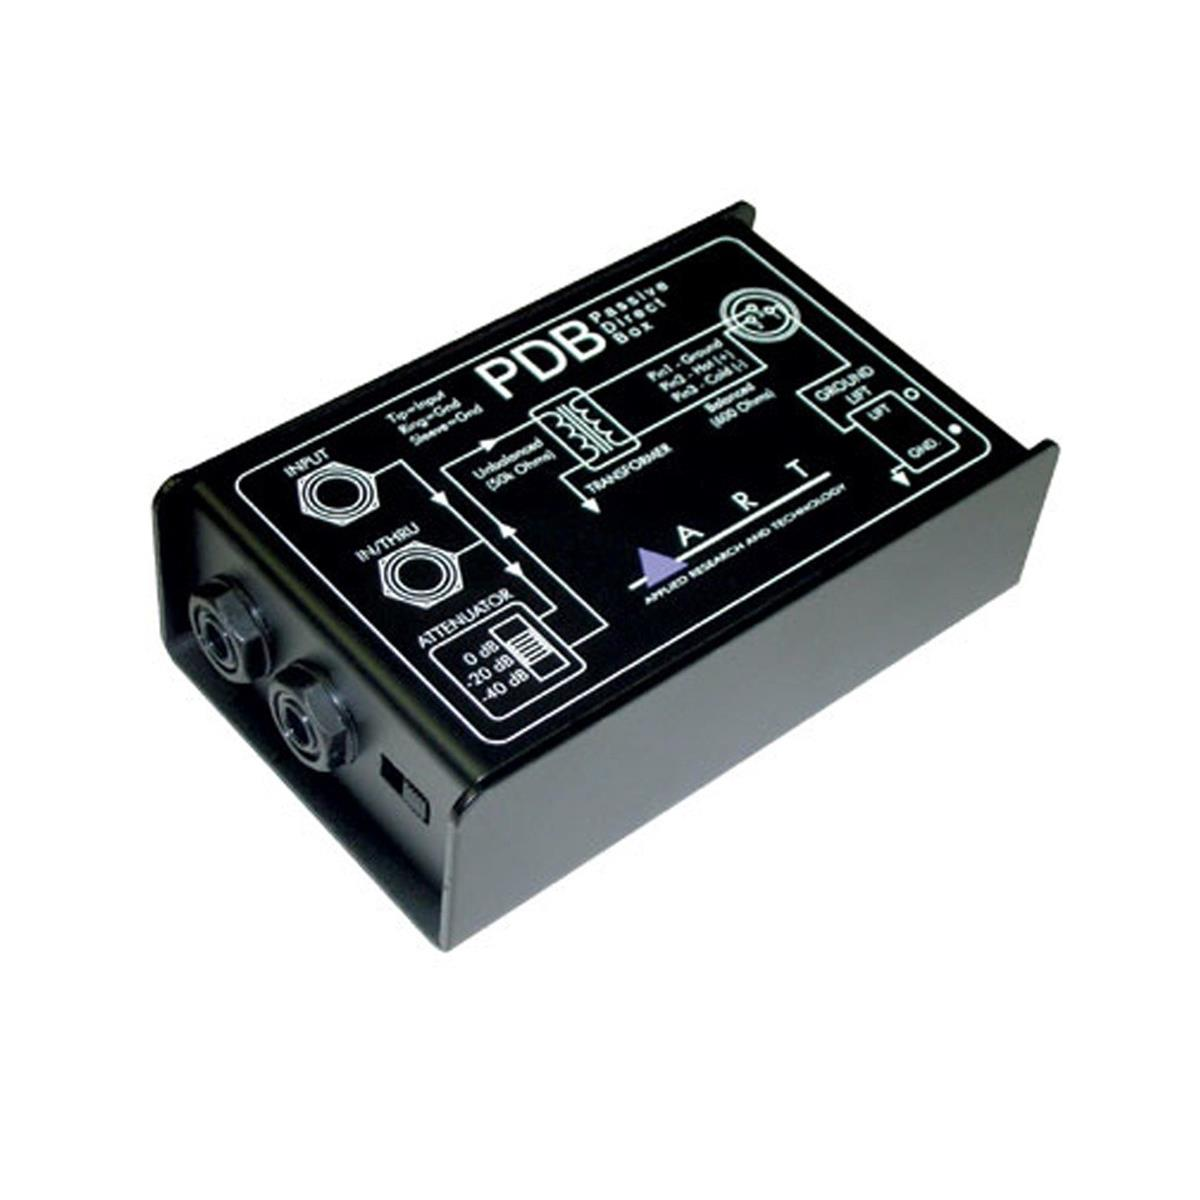 ART-PDB-DI-BOX-MONO-sku-859